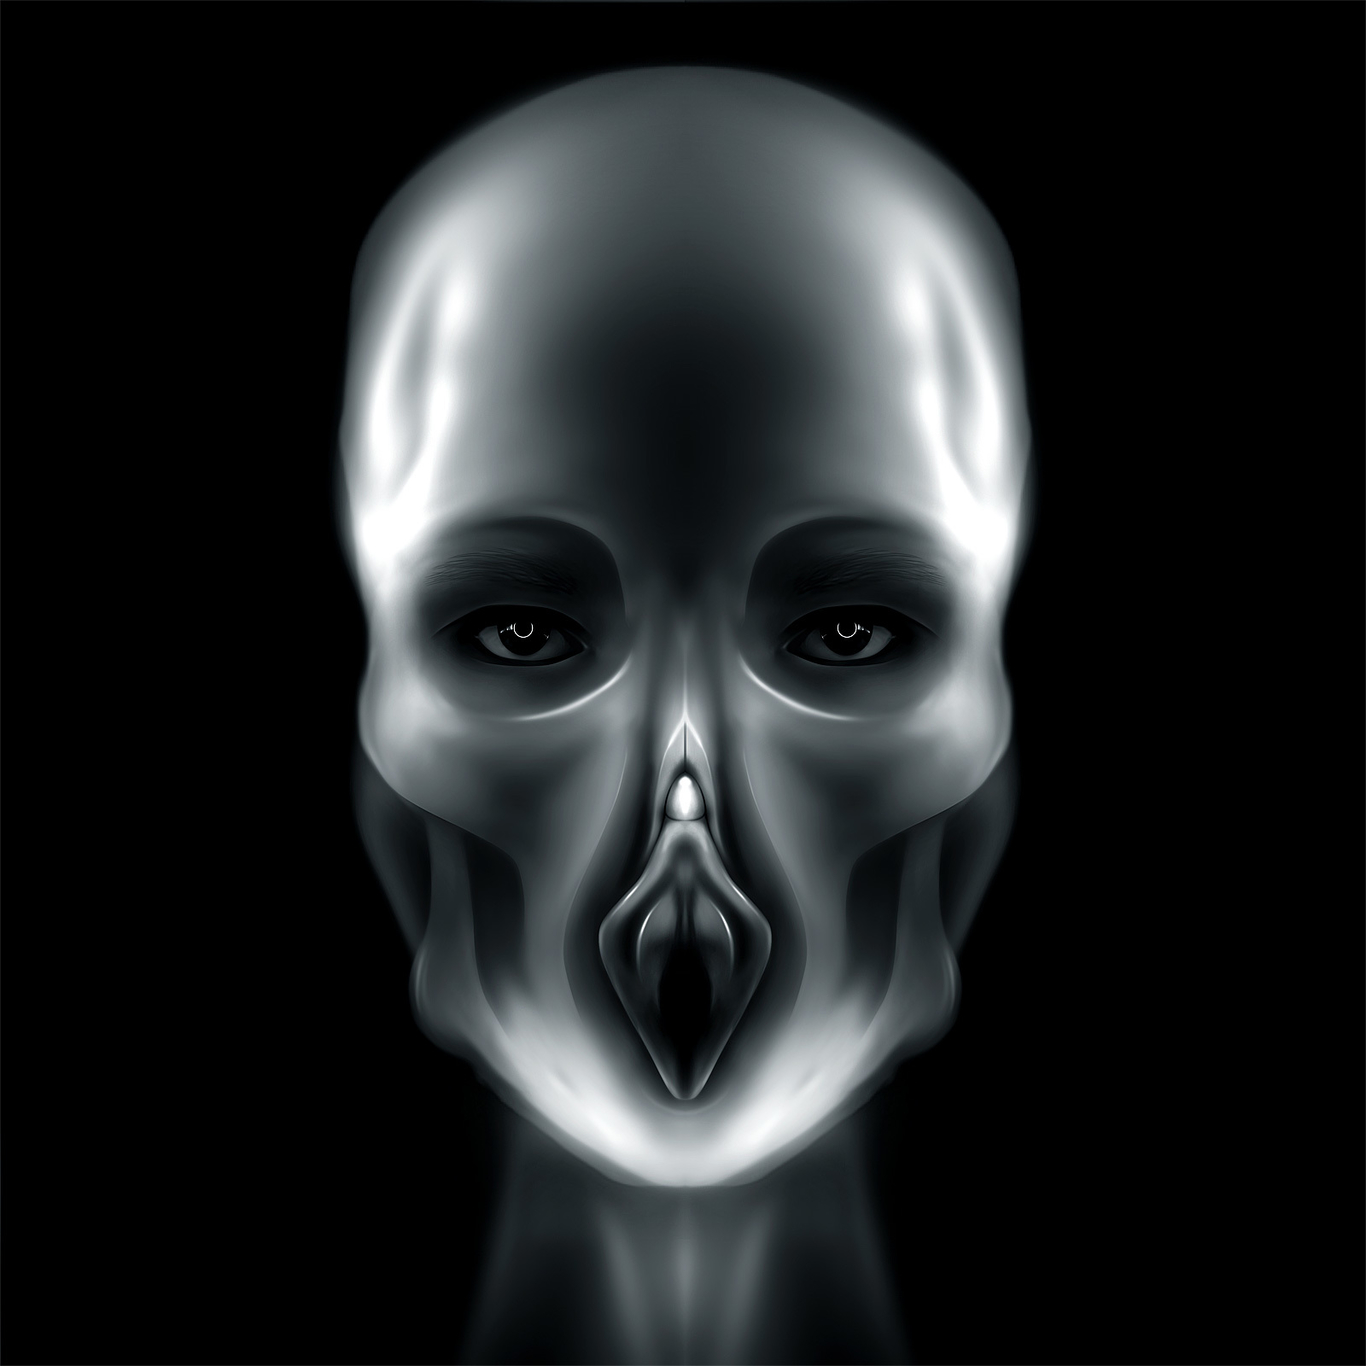 Vampeta skull 1 3e49c034 lzrb